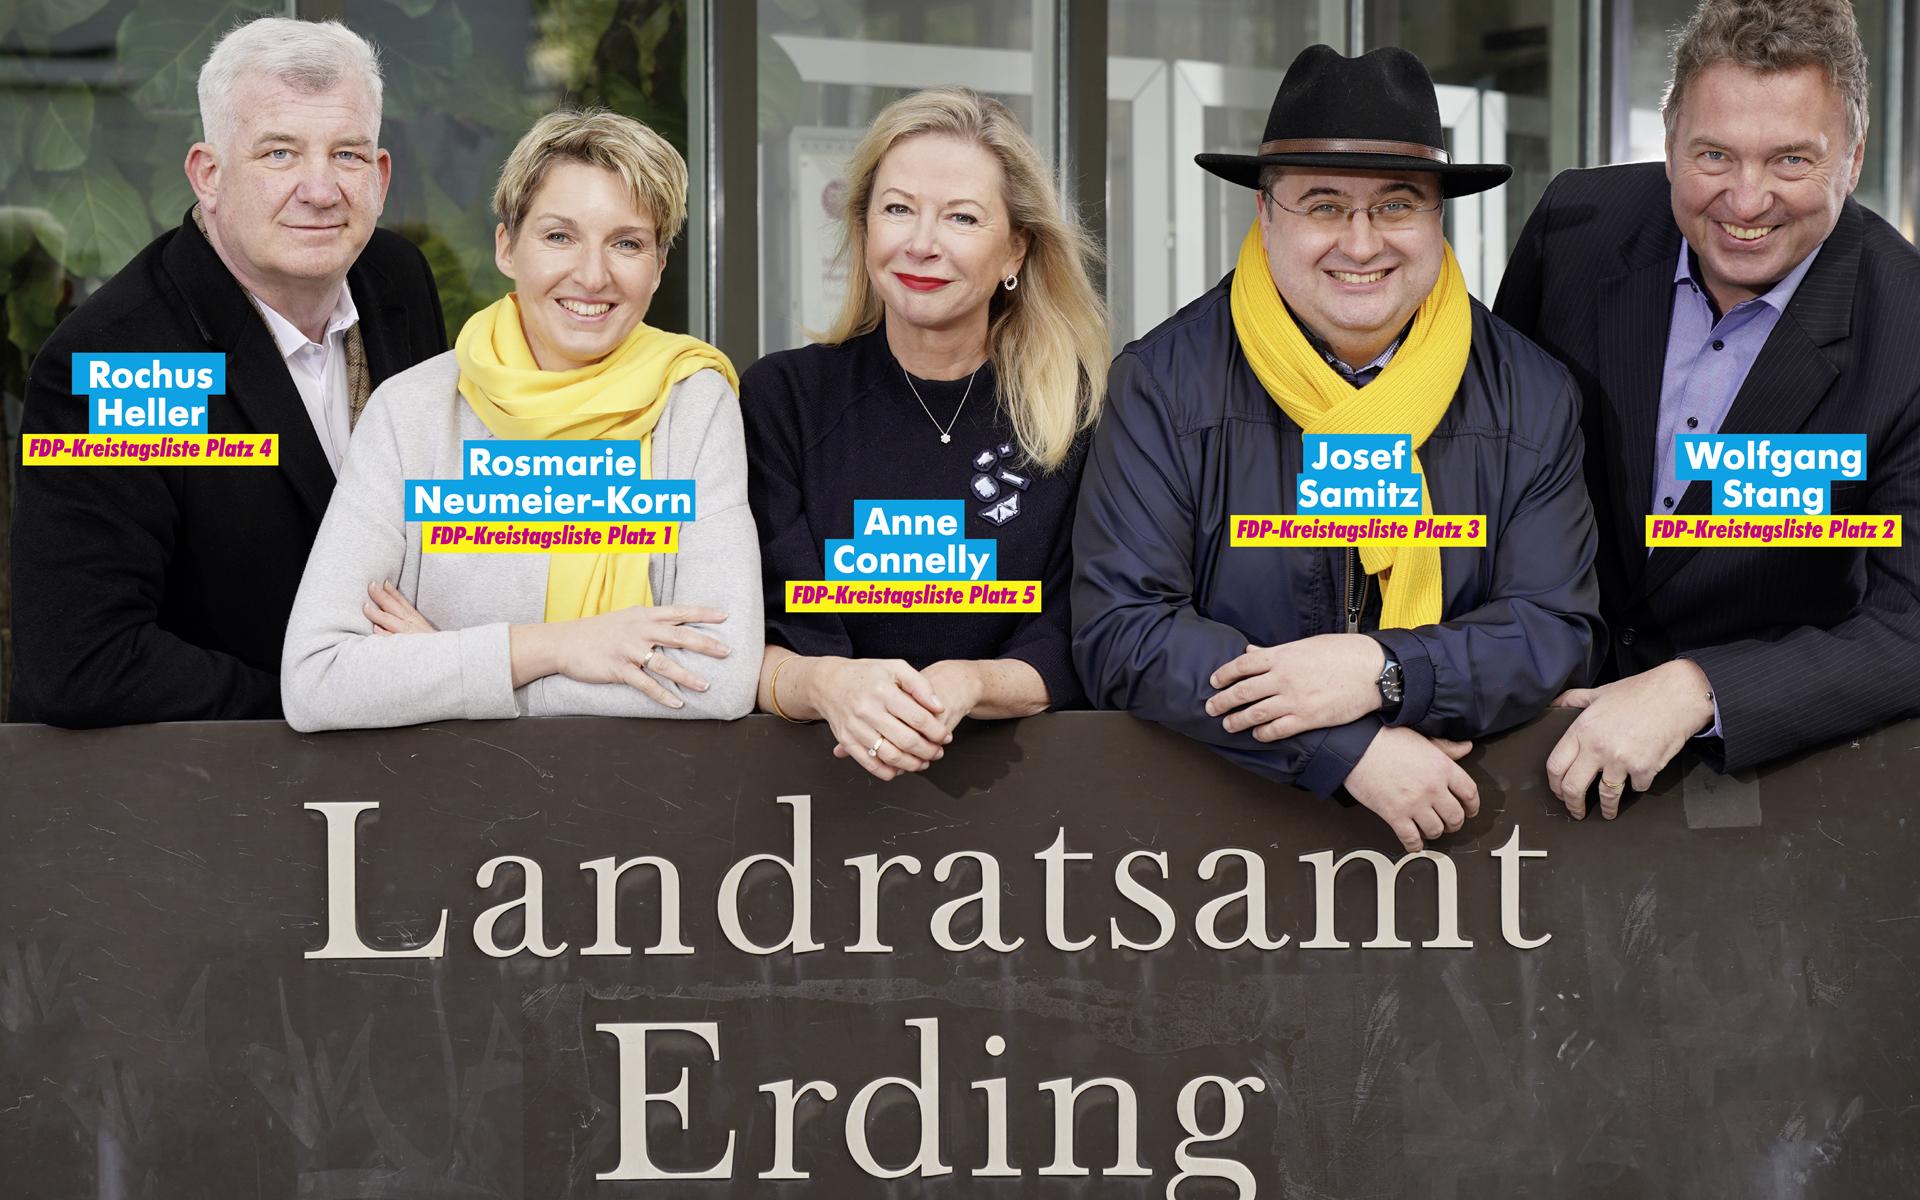 FDP Erding Rochus Heller Rosmarie Neumeier Anne Connelly Josef Samitz Wolfgang Stang Landratsamt Erding Team Wer seine Heimat liebt macht sie besser 2